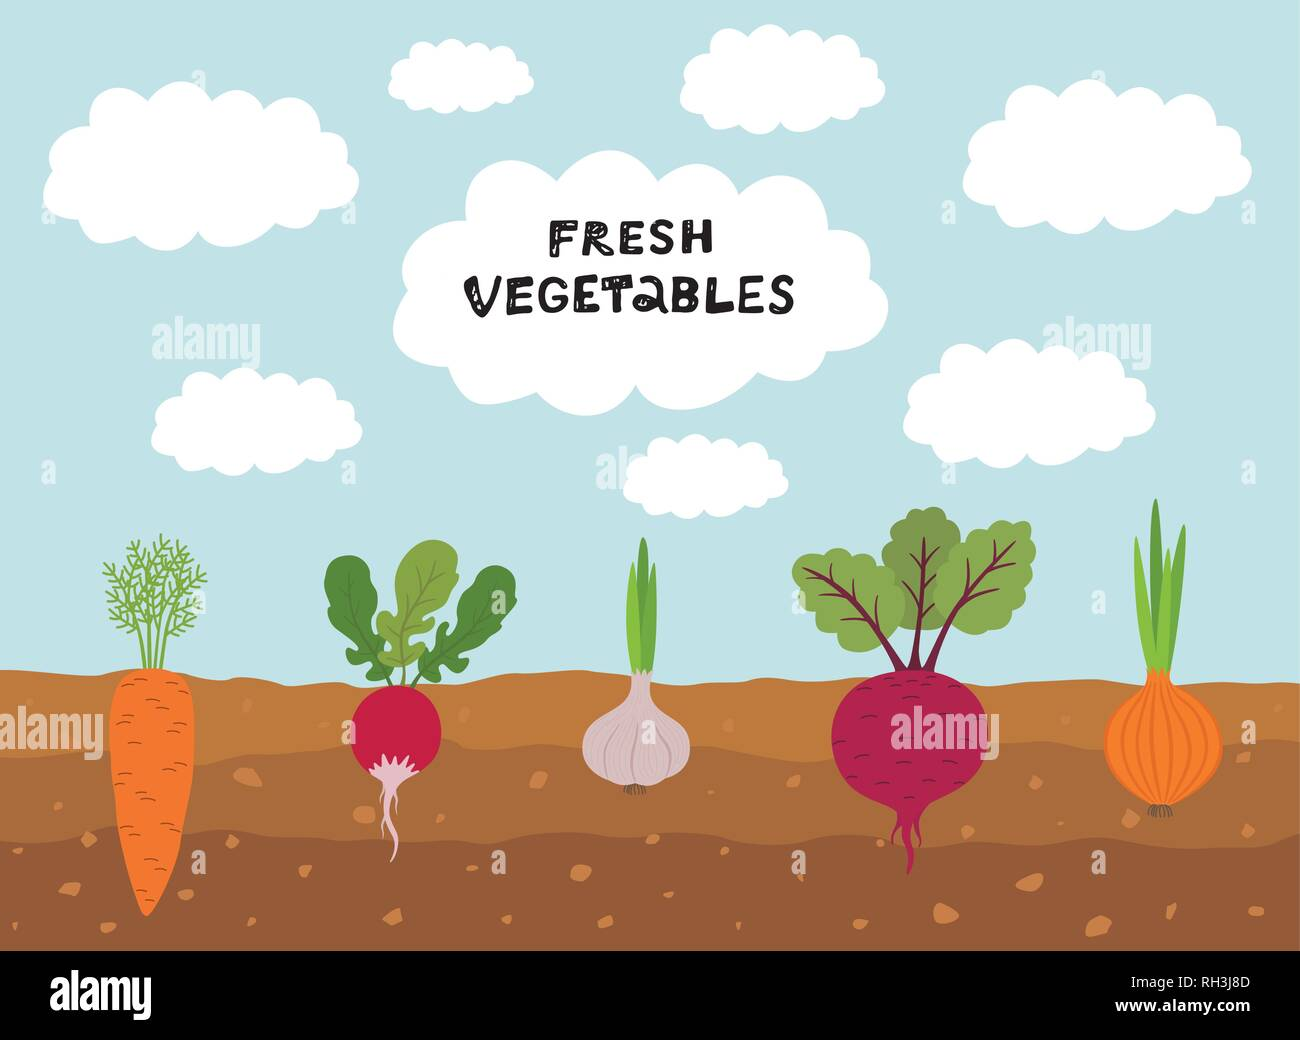 Fresh organic vegetable garden on blue sky background. Set vegetables plant growing underground carrot, onion, garlic, radish, beet. - Stock Vector